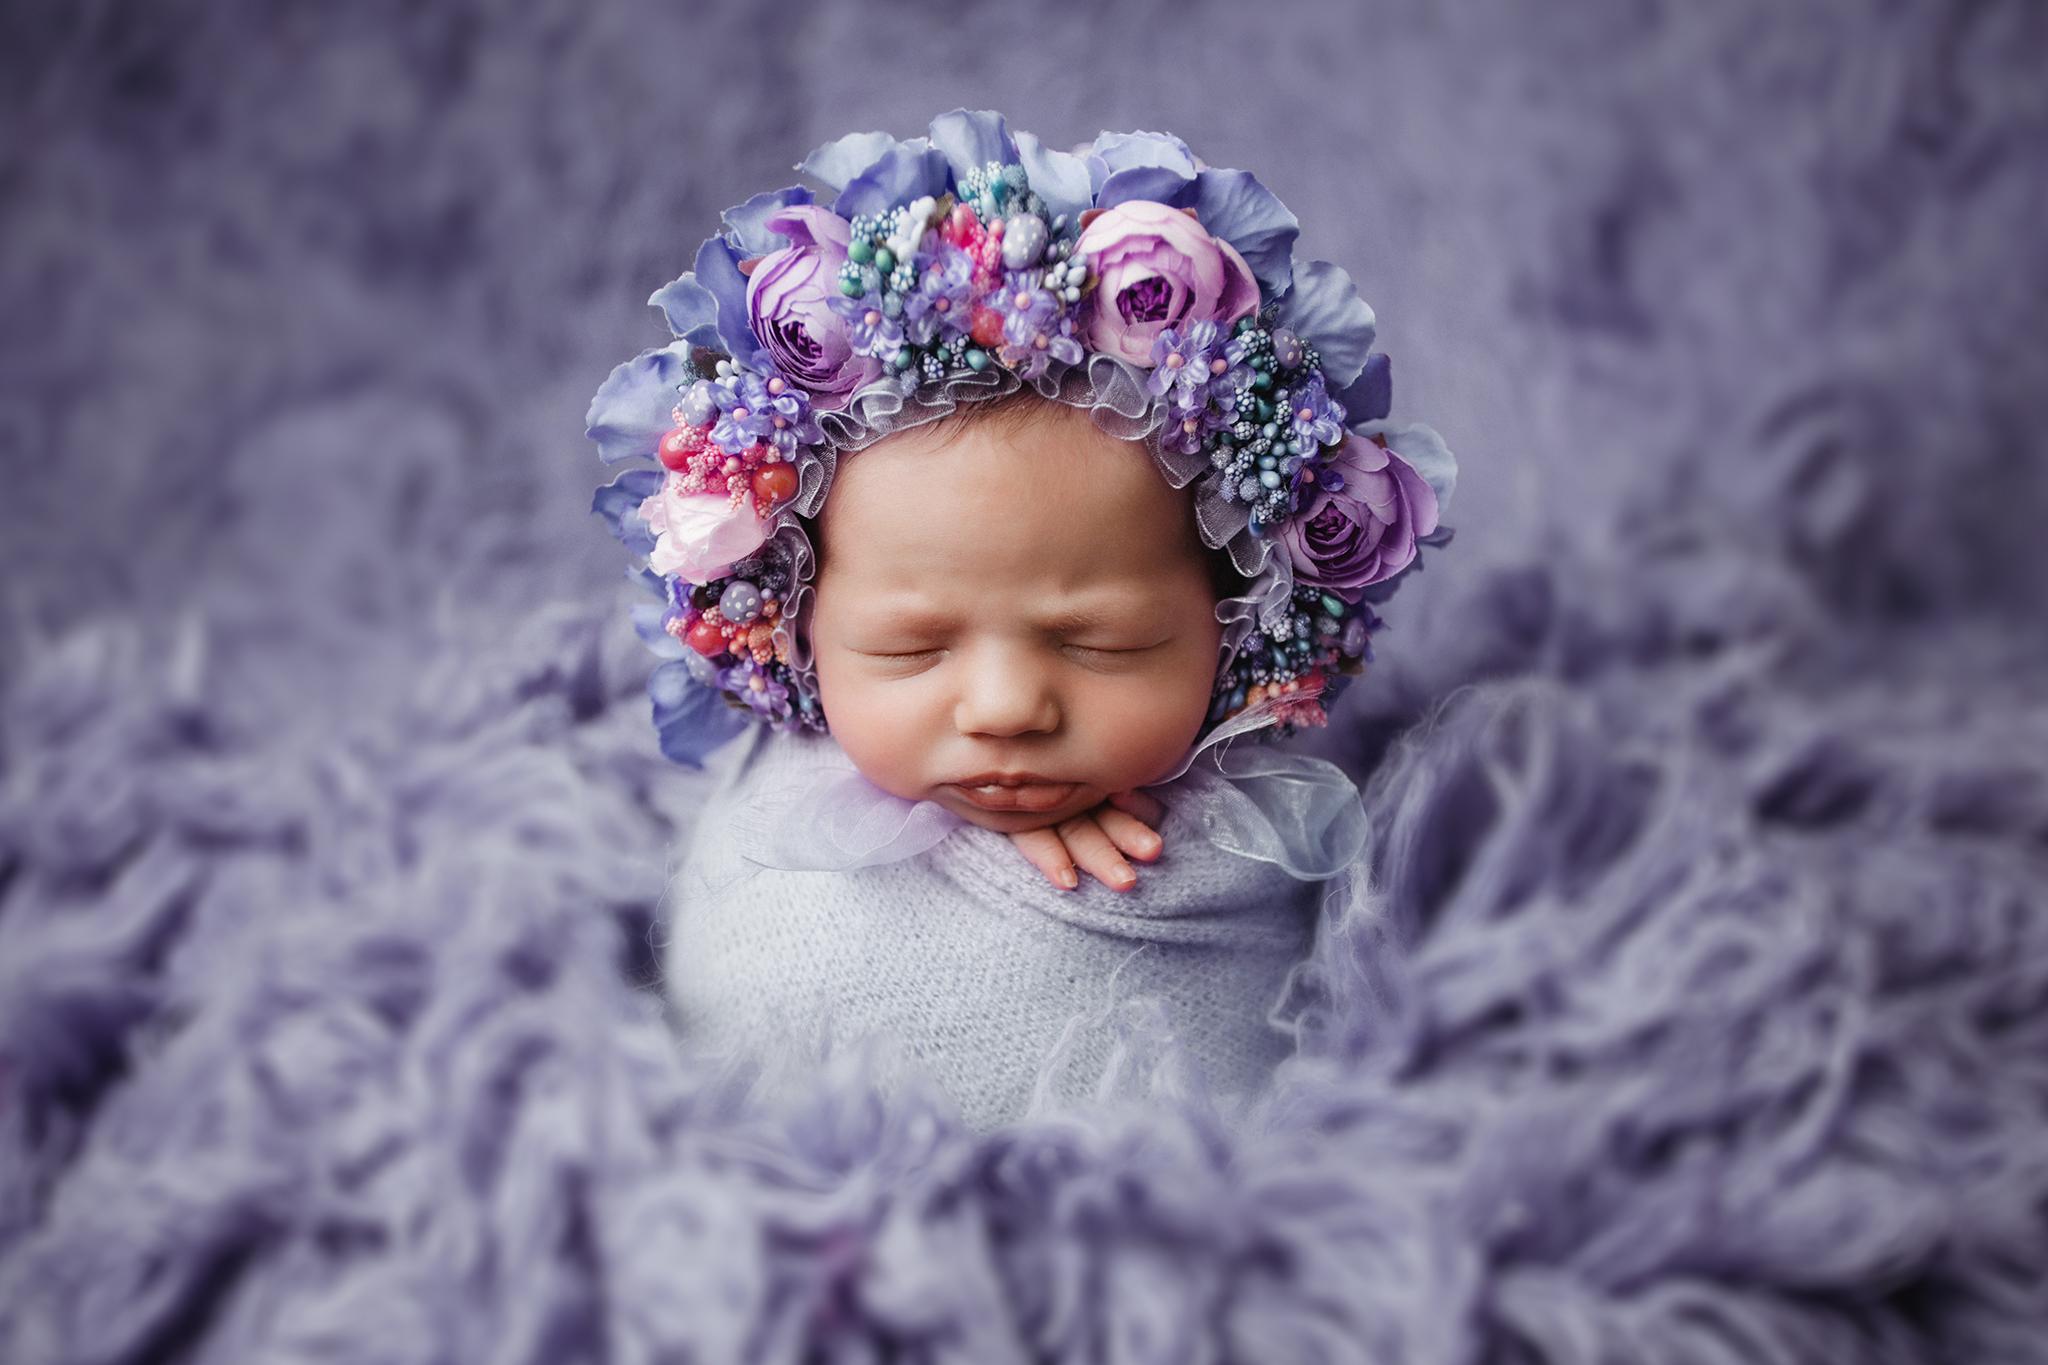 Michael Stief Newborn Photography 49.jpg